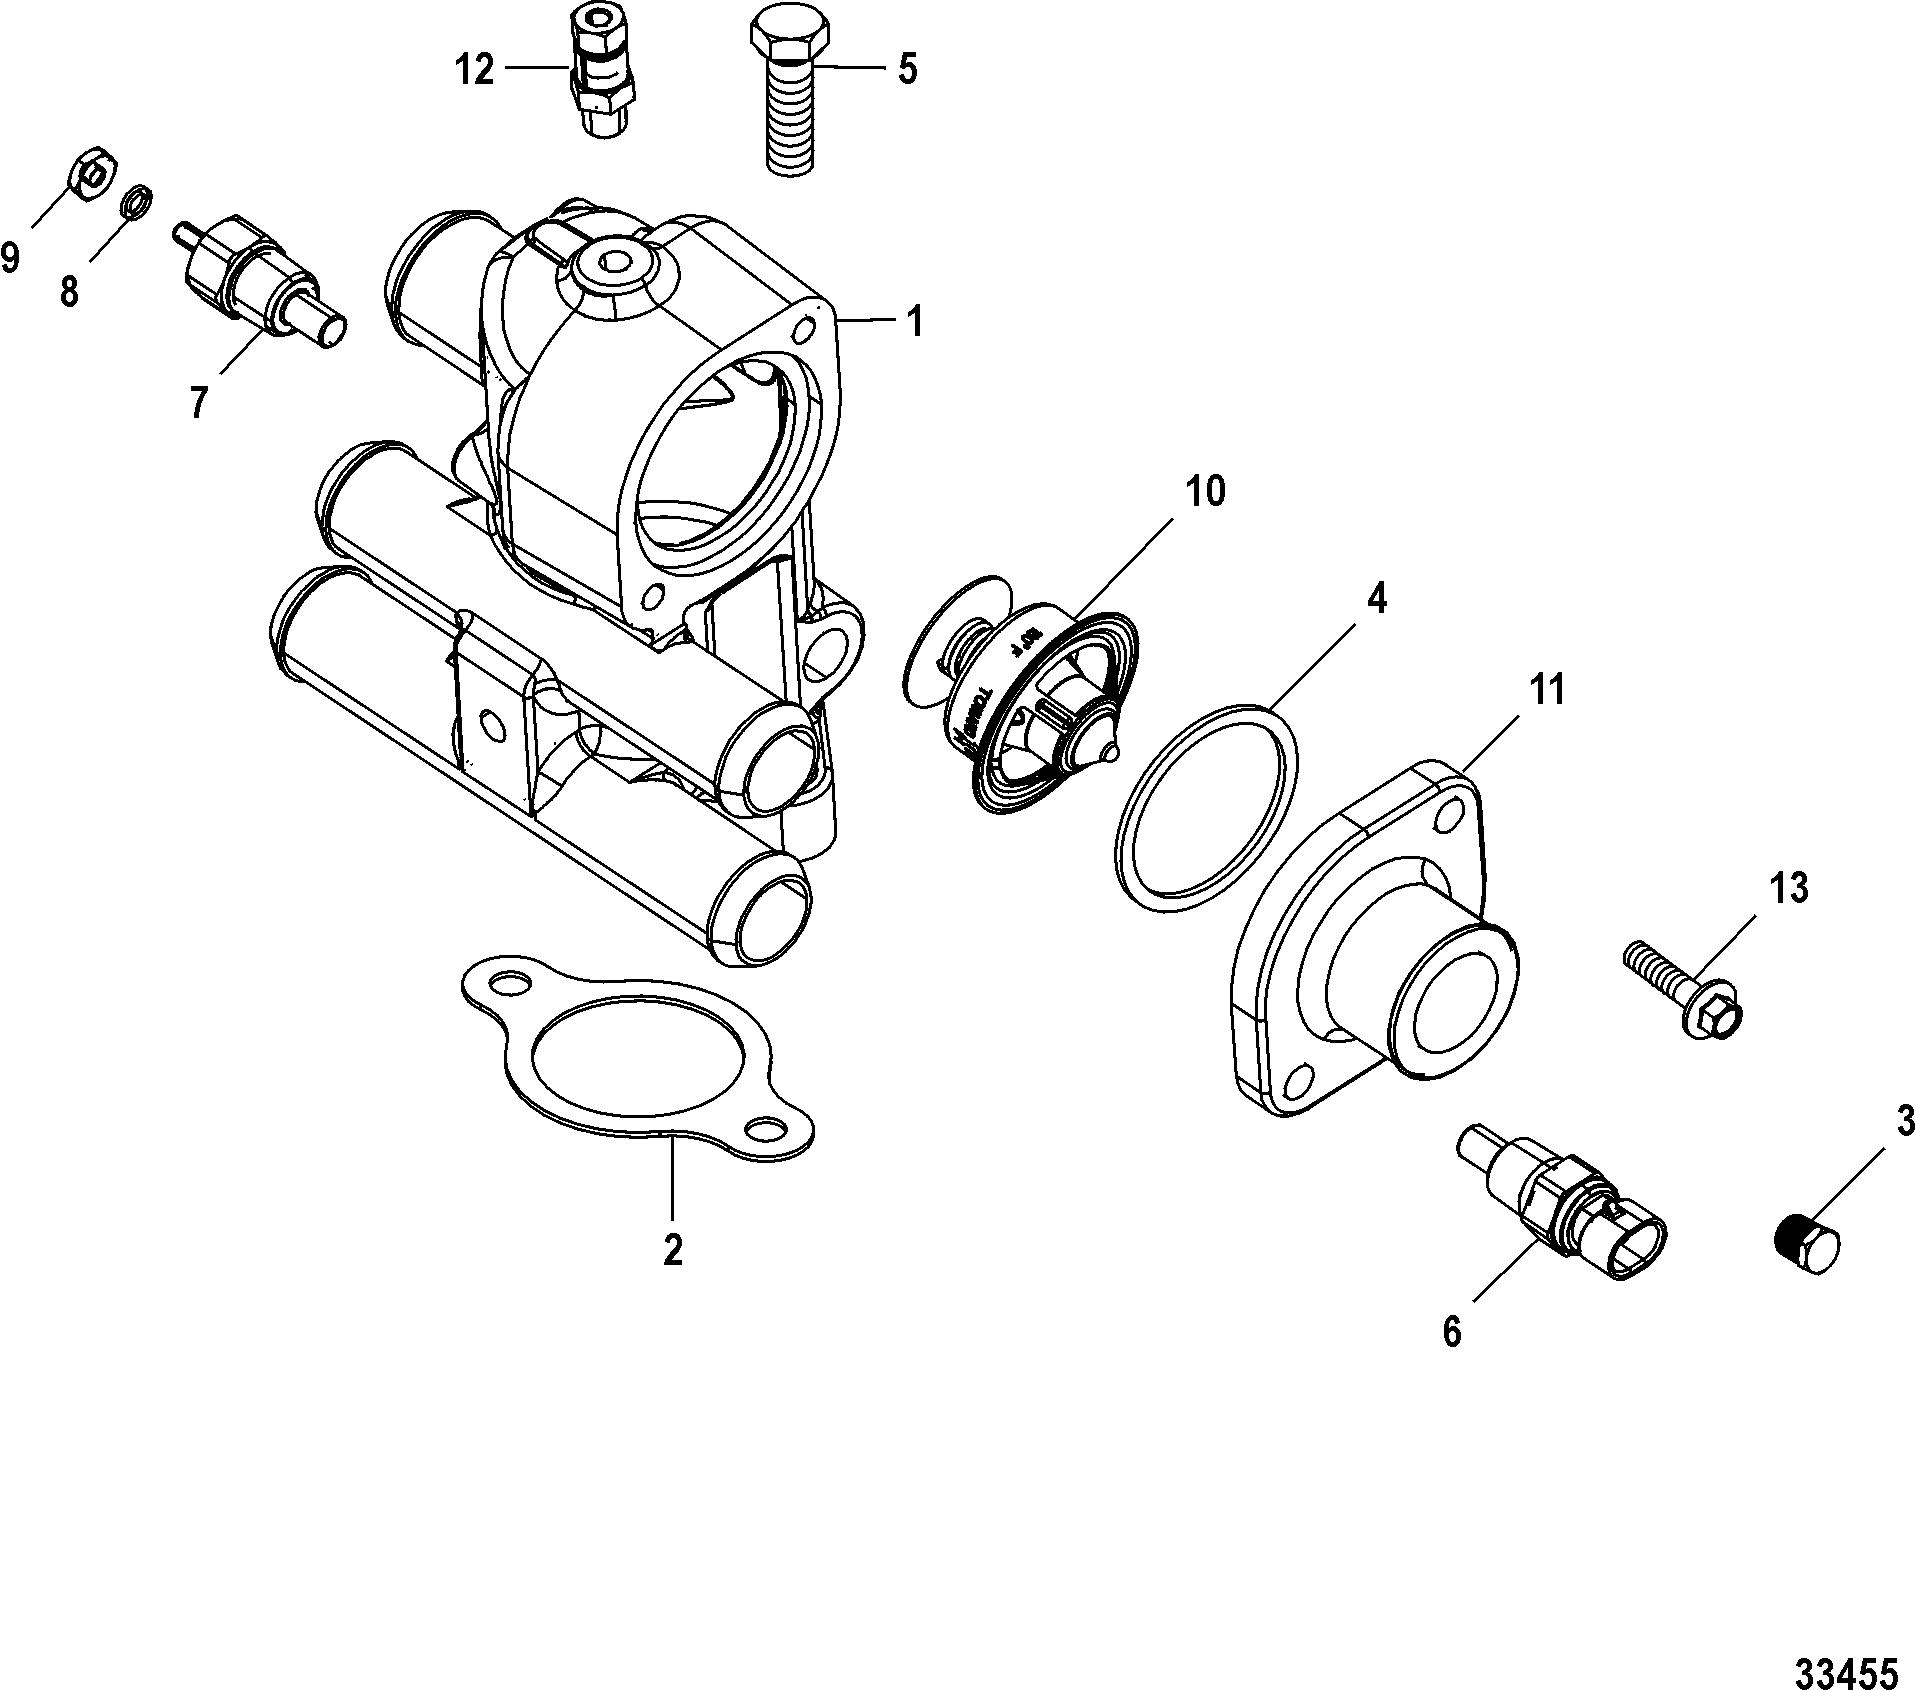 Mercruiser 350 Mag Mpi Horizon